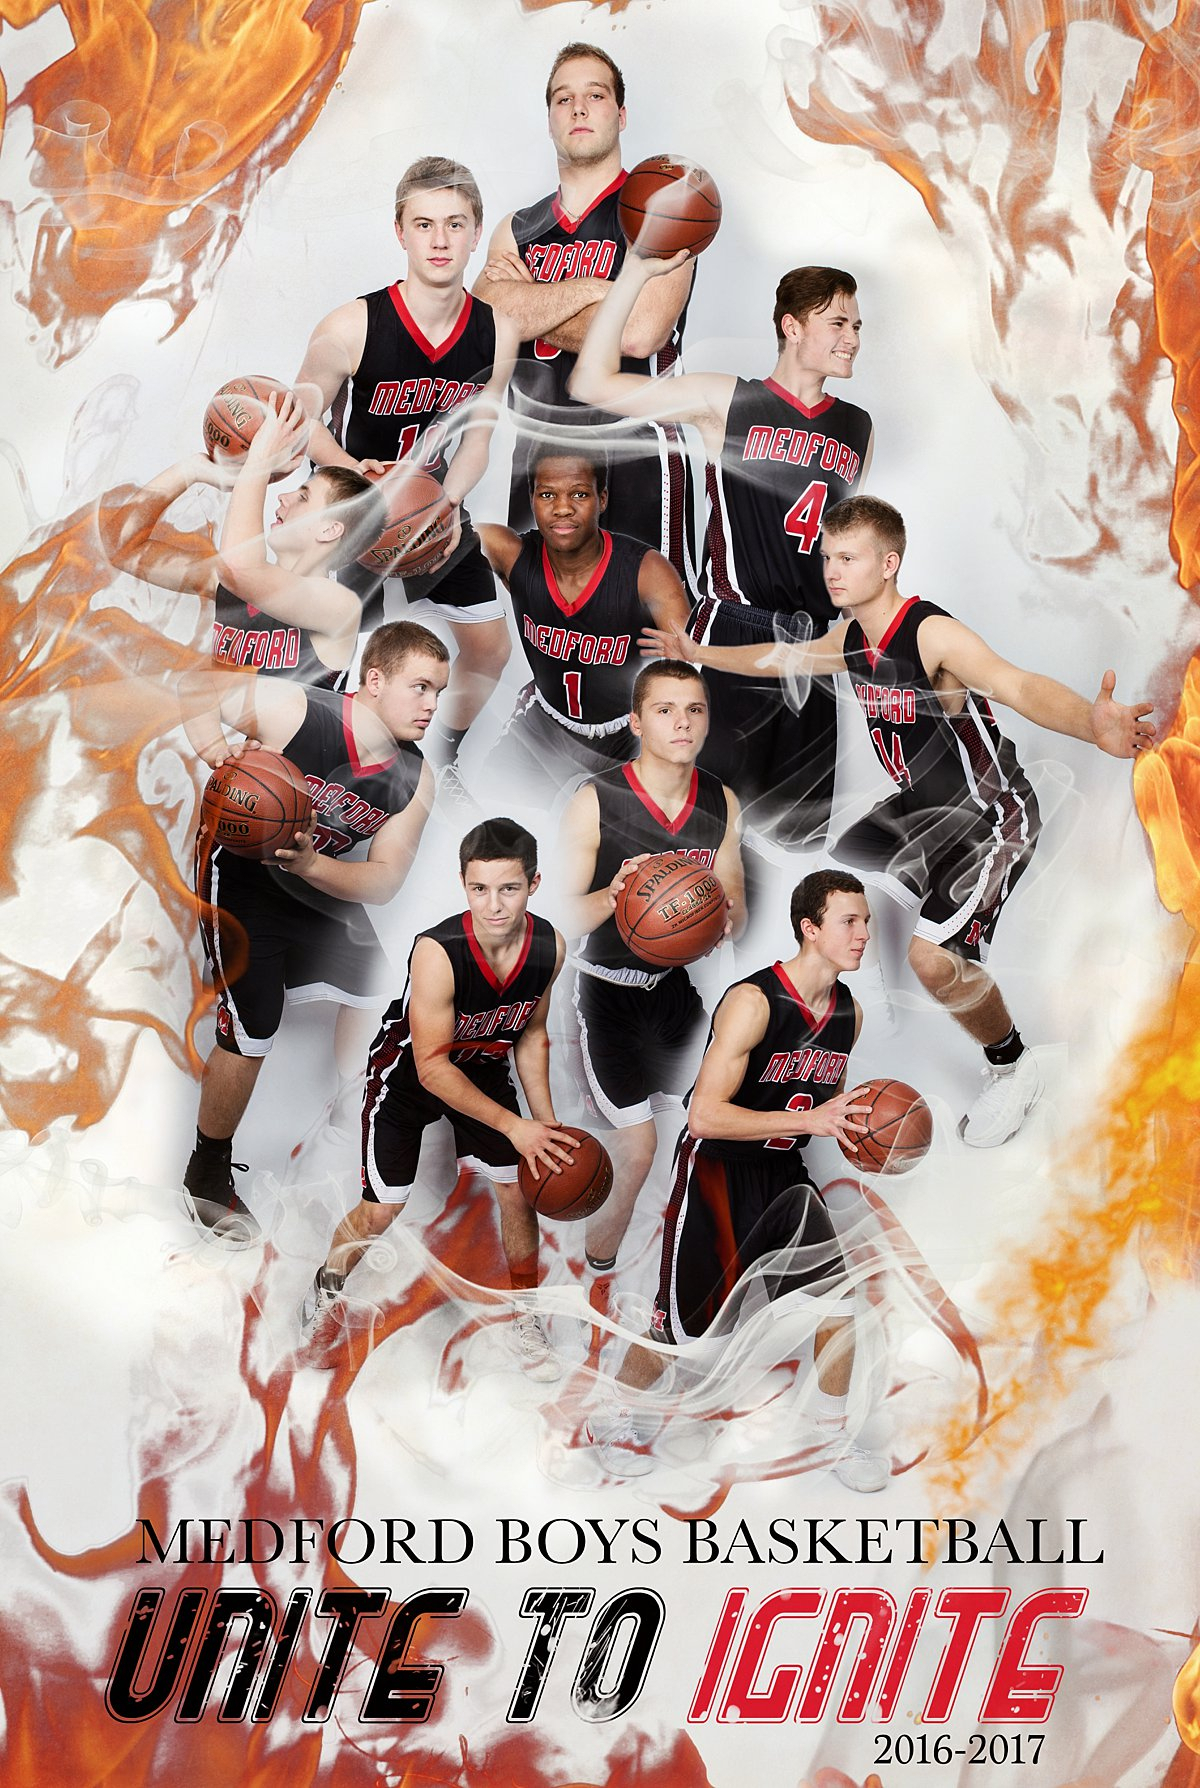 10 Gorgeous High School Basketball Poster Ideas high school basketball sports poster ideas photo james stokes 2020